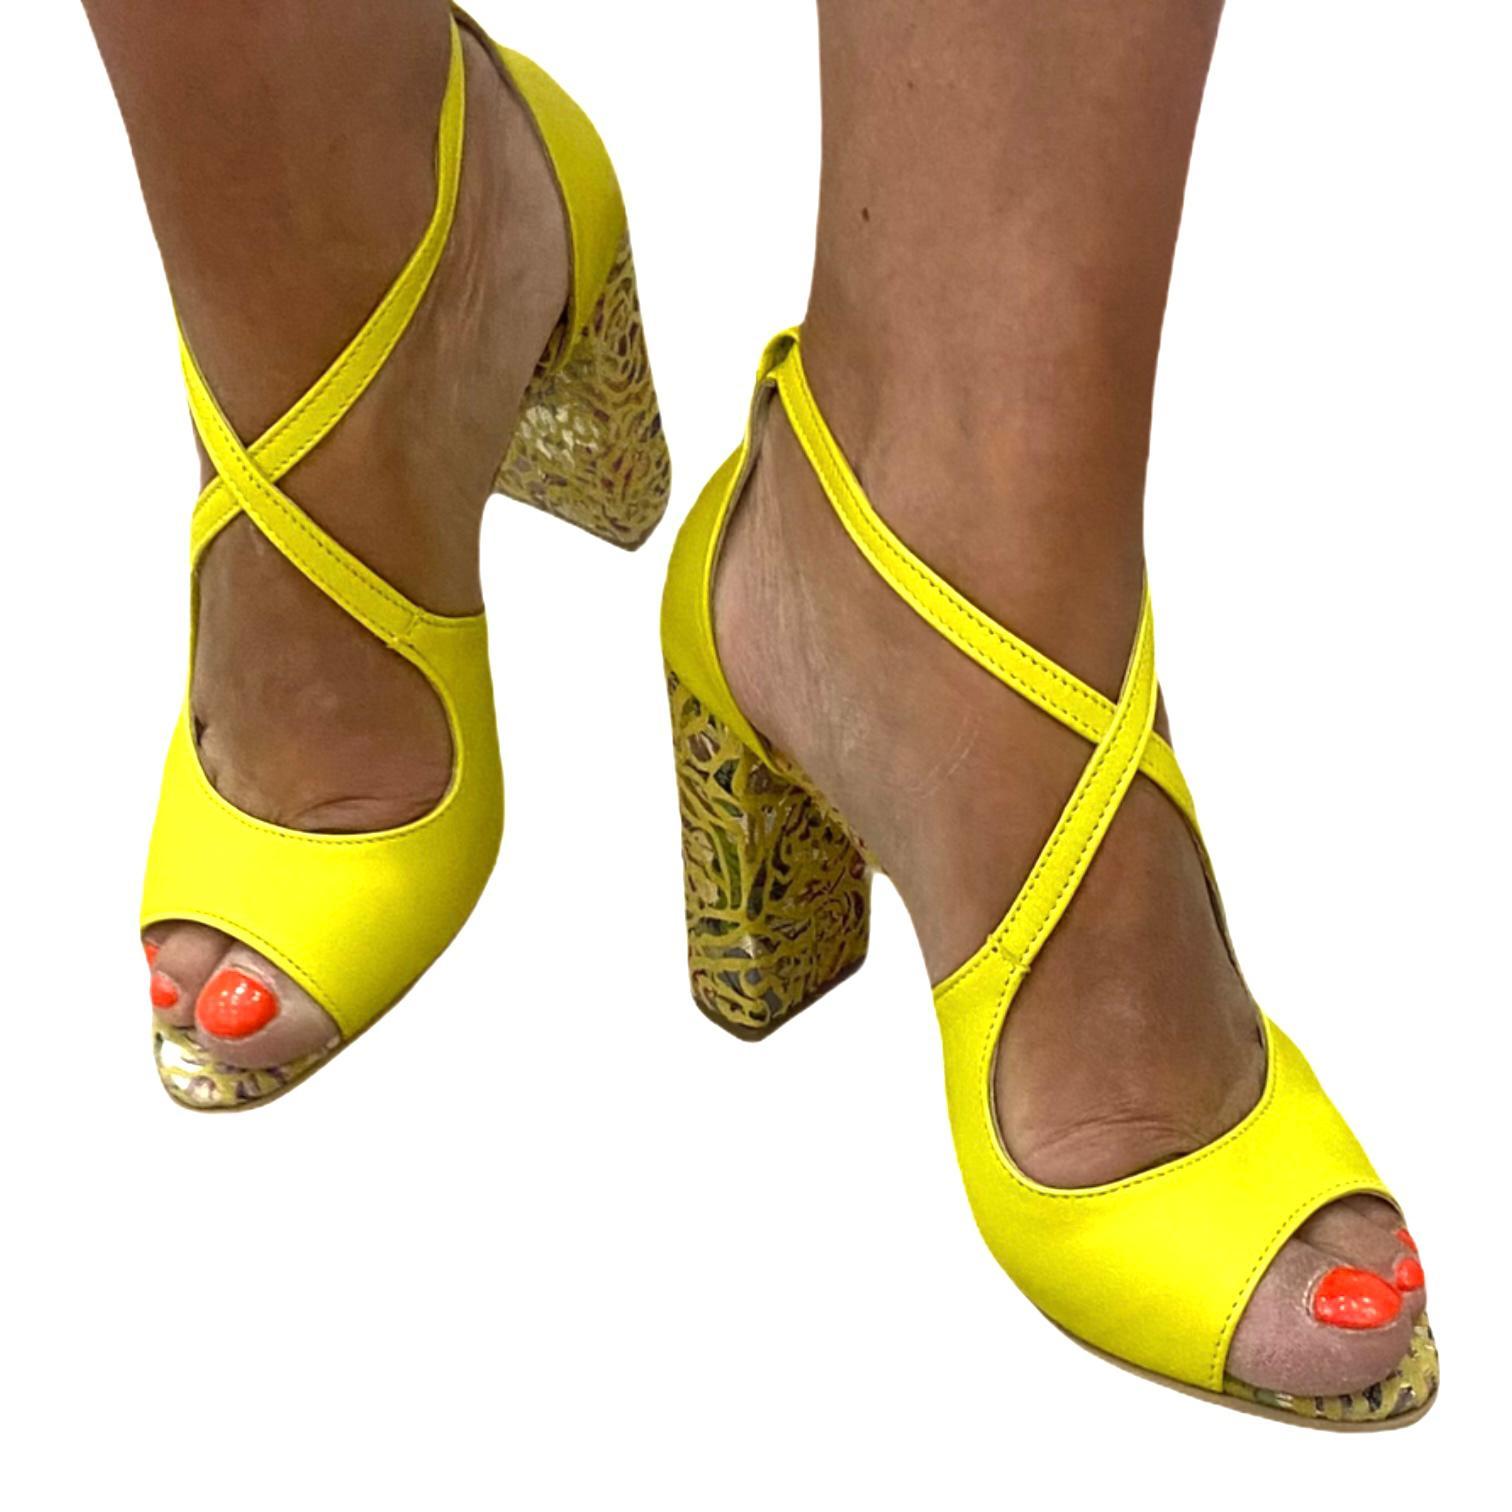 Sandale galbene cu toc colorat si barete incrucisate